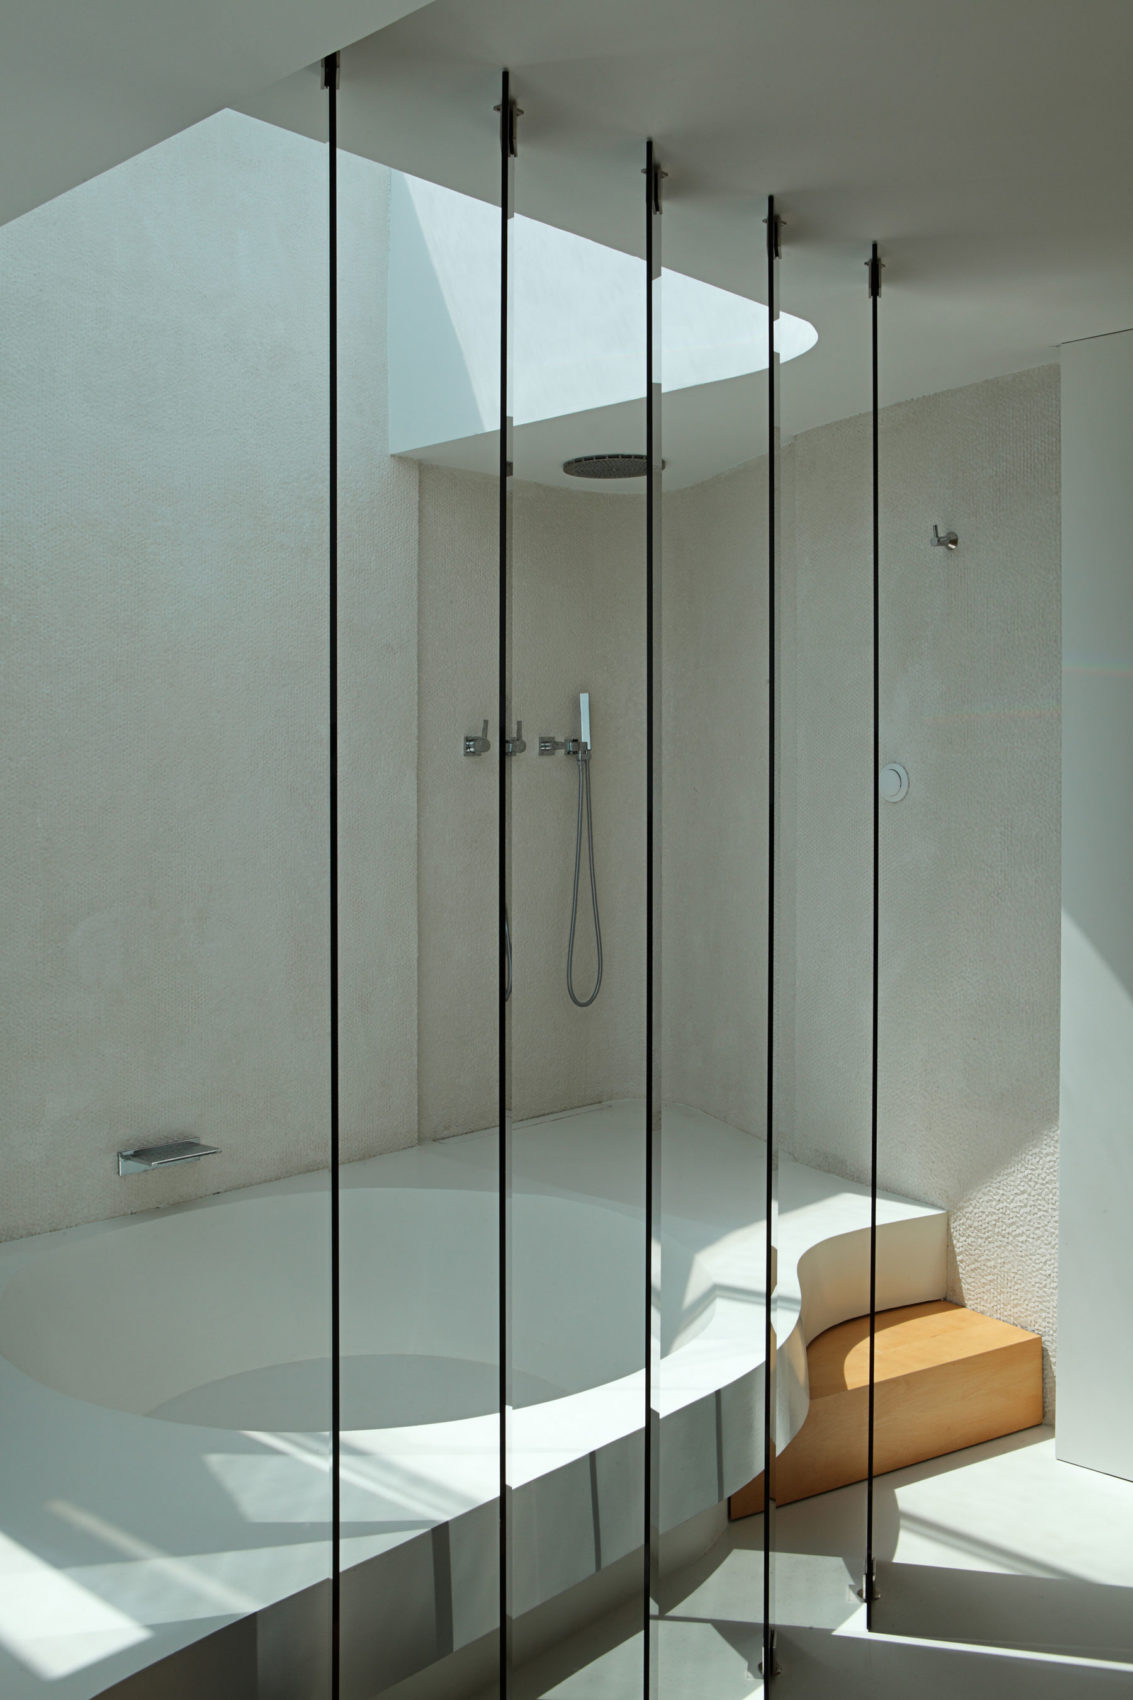 Penthouse by Josep Ruà Spatial designer (27)